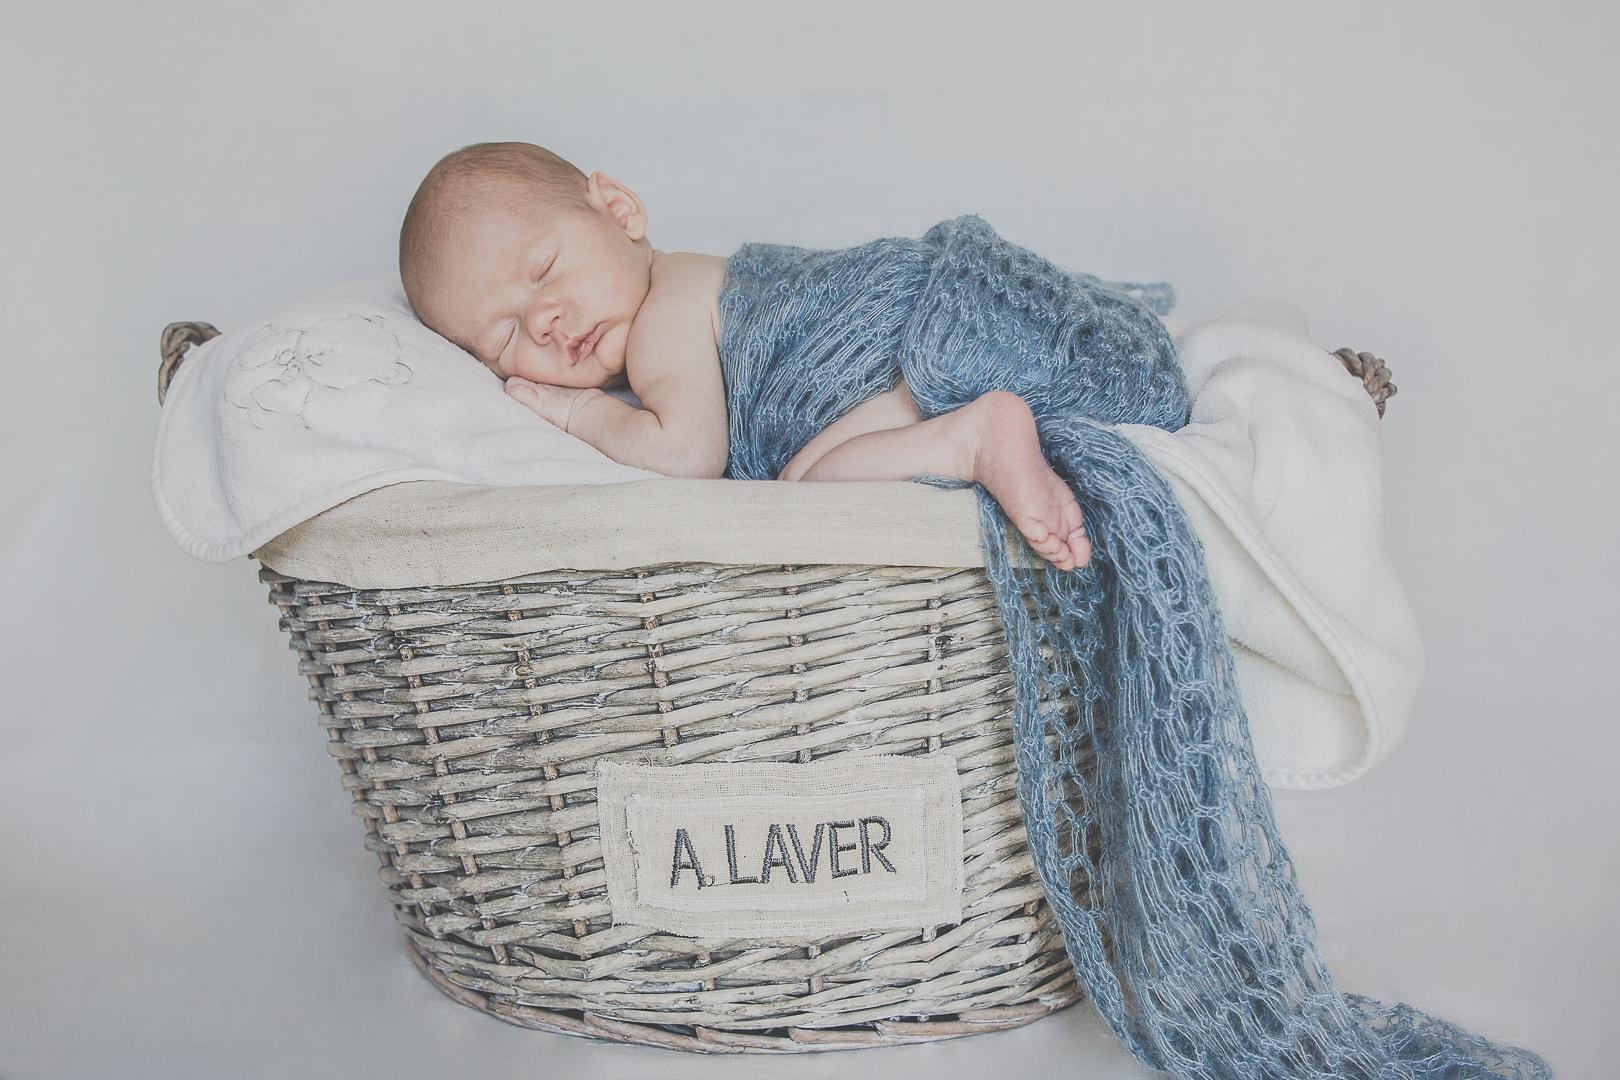 trezors-photography-photographe-professionnel-toulouse-31-maternite-bebe-nouveau-ne